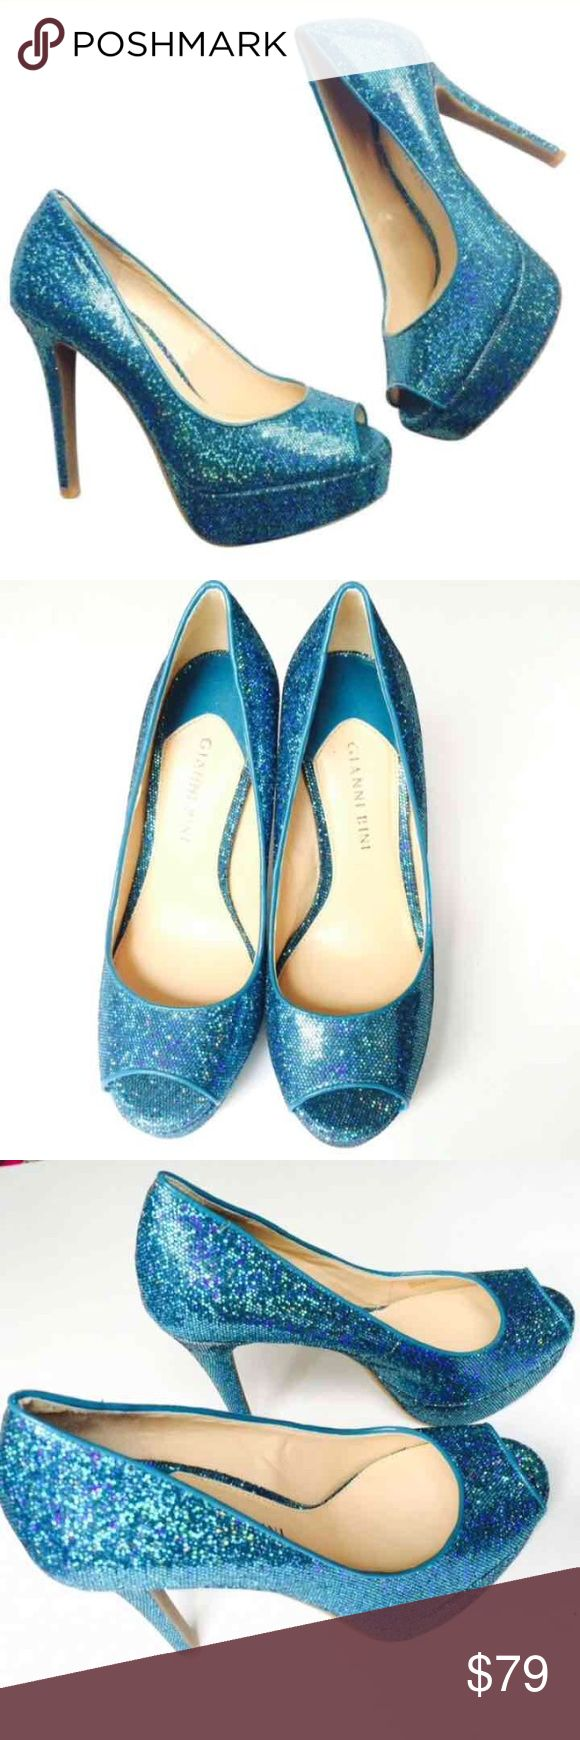 New SZ 6 Gianni Bini Heels Gianni Bini Heels Multicolored Sparkle Gorgeous On New  Size 6  Retail $139.00 Gianni Bini Shoes Heels